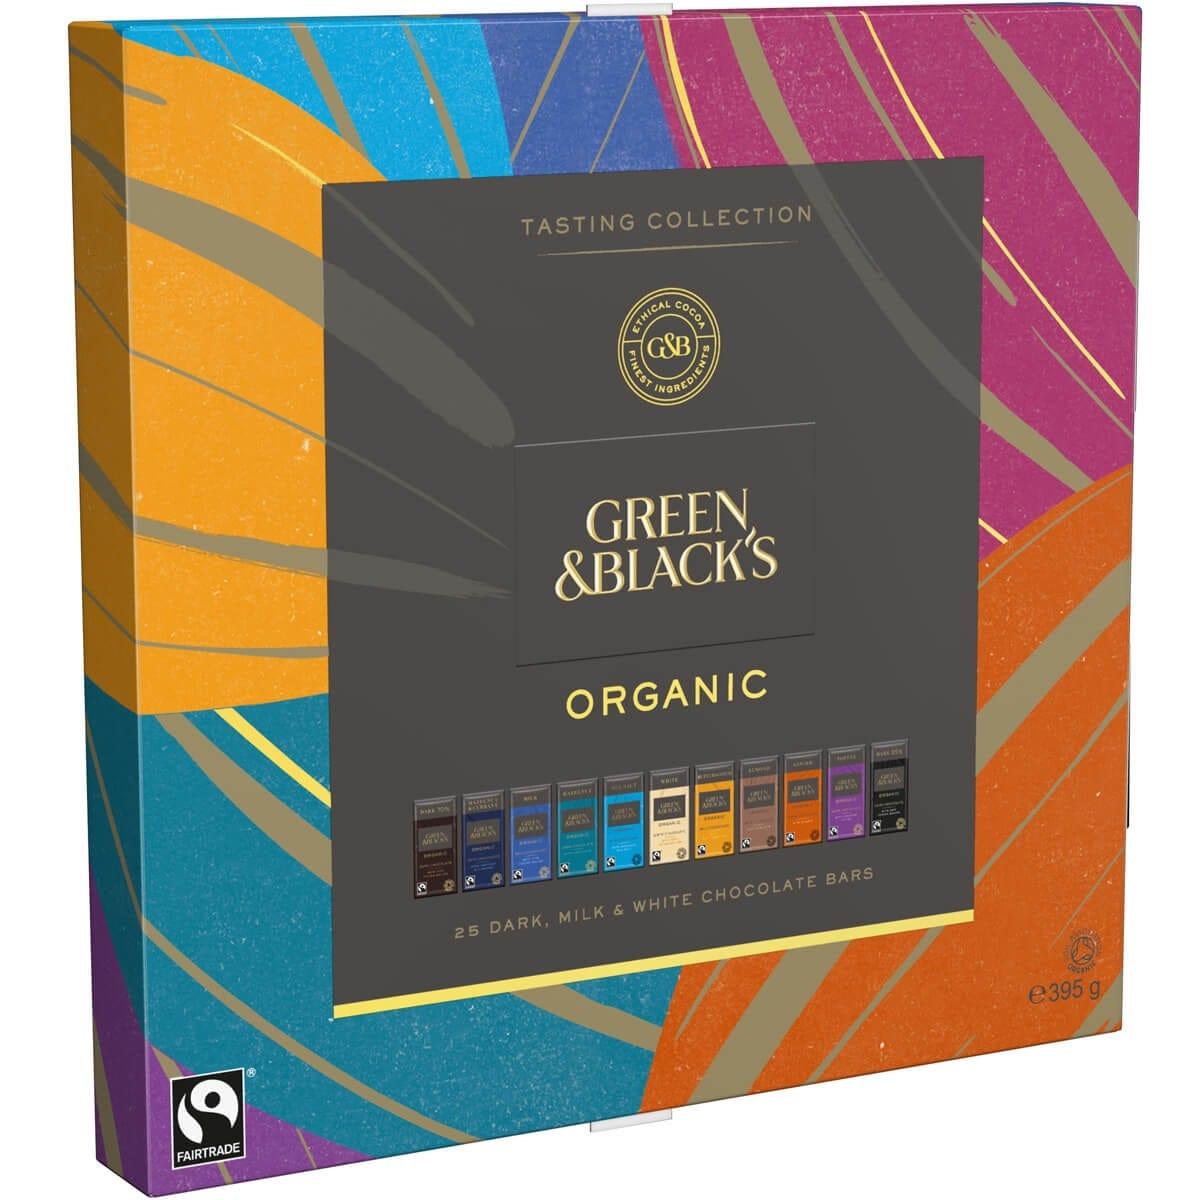 GB Organic Tasting Collecti...